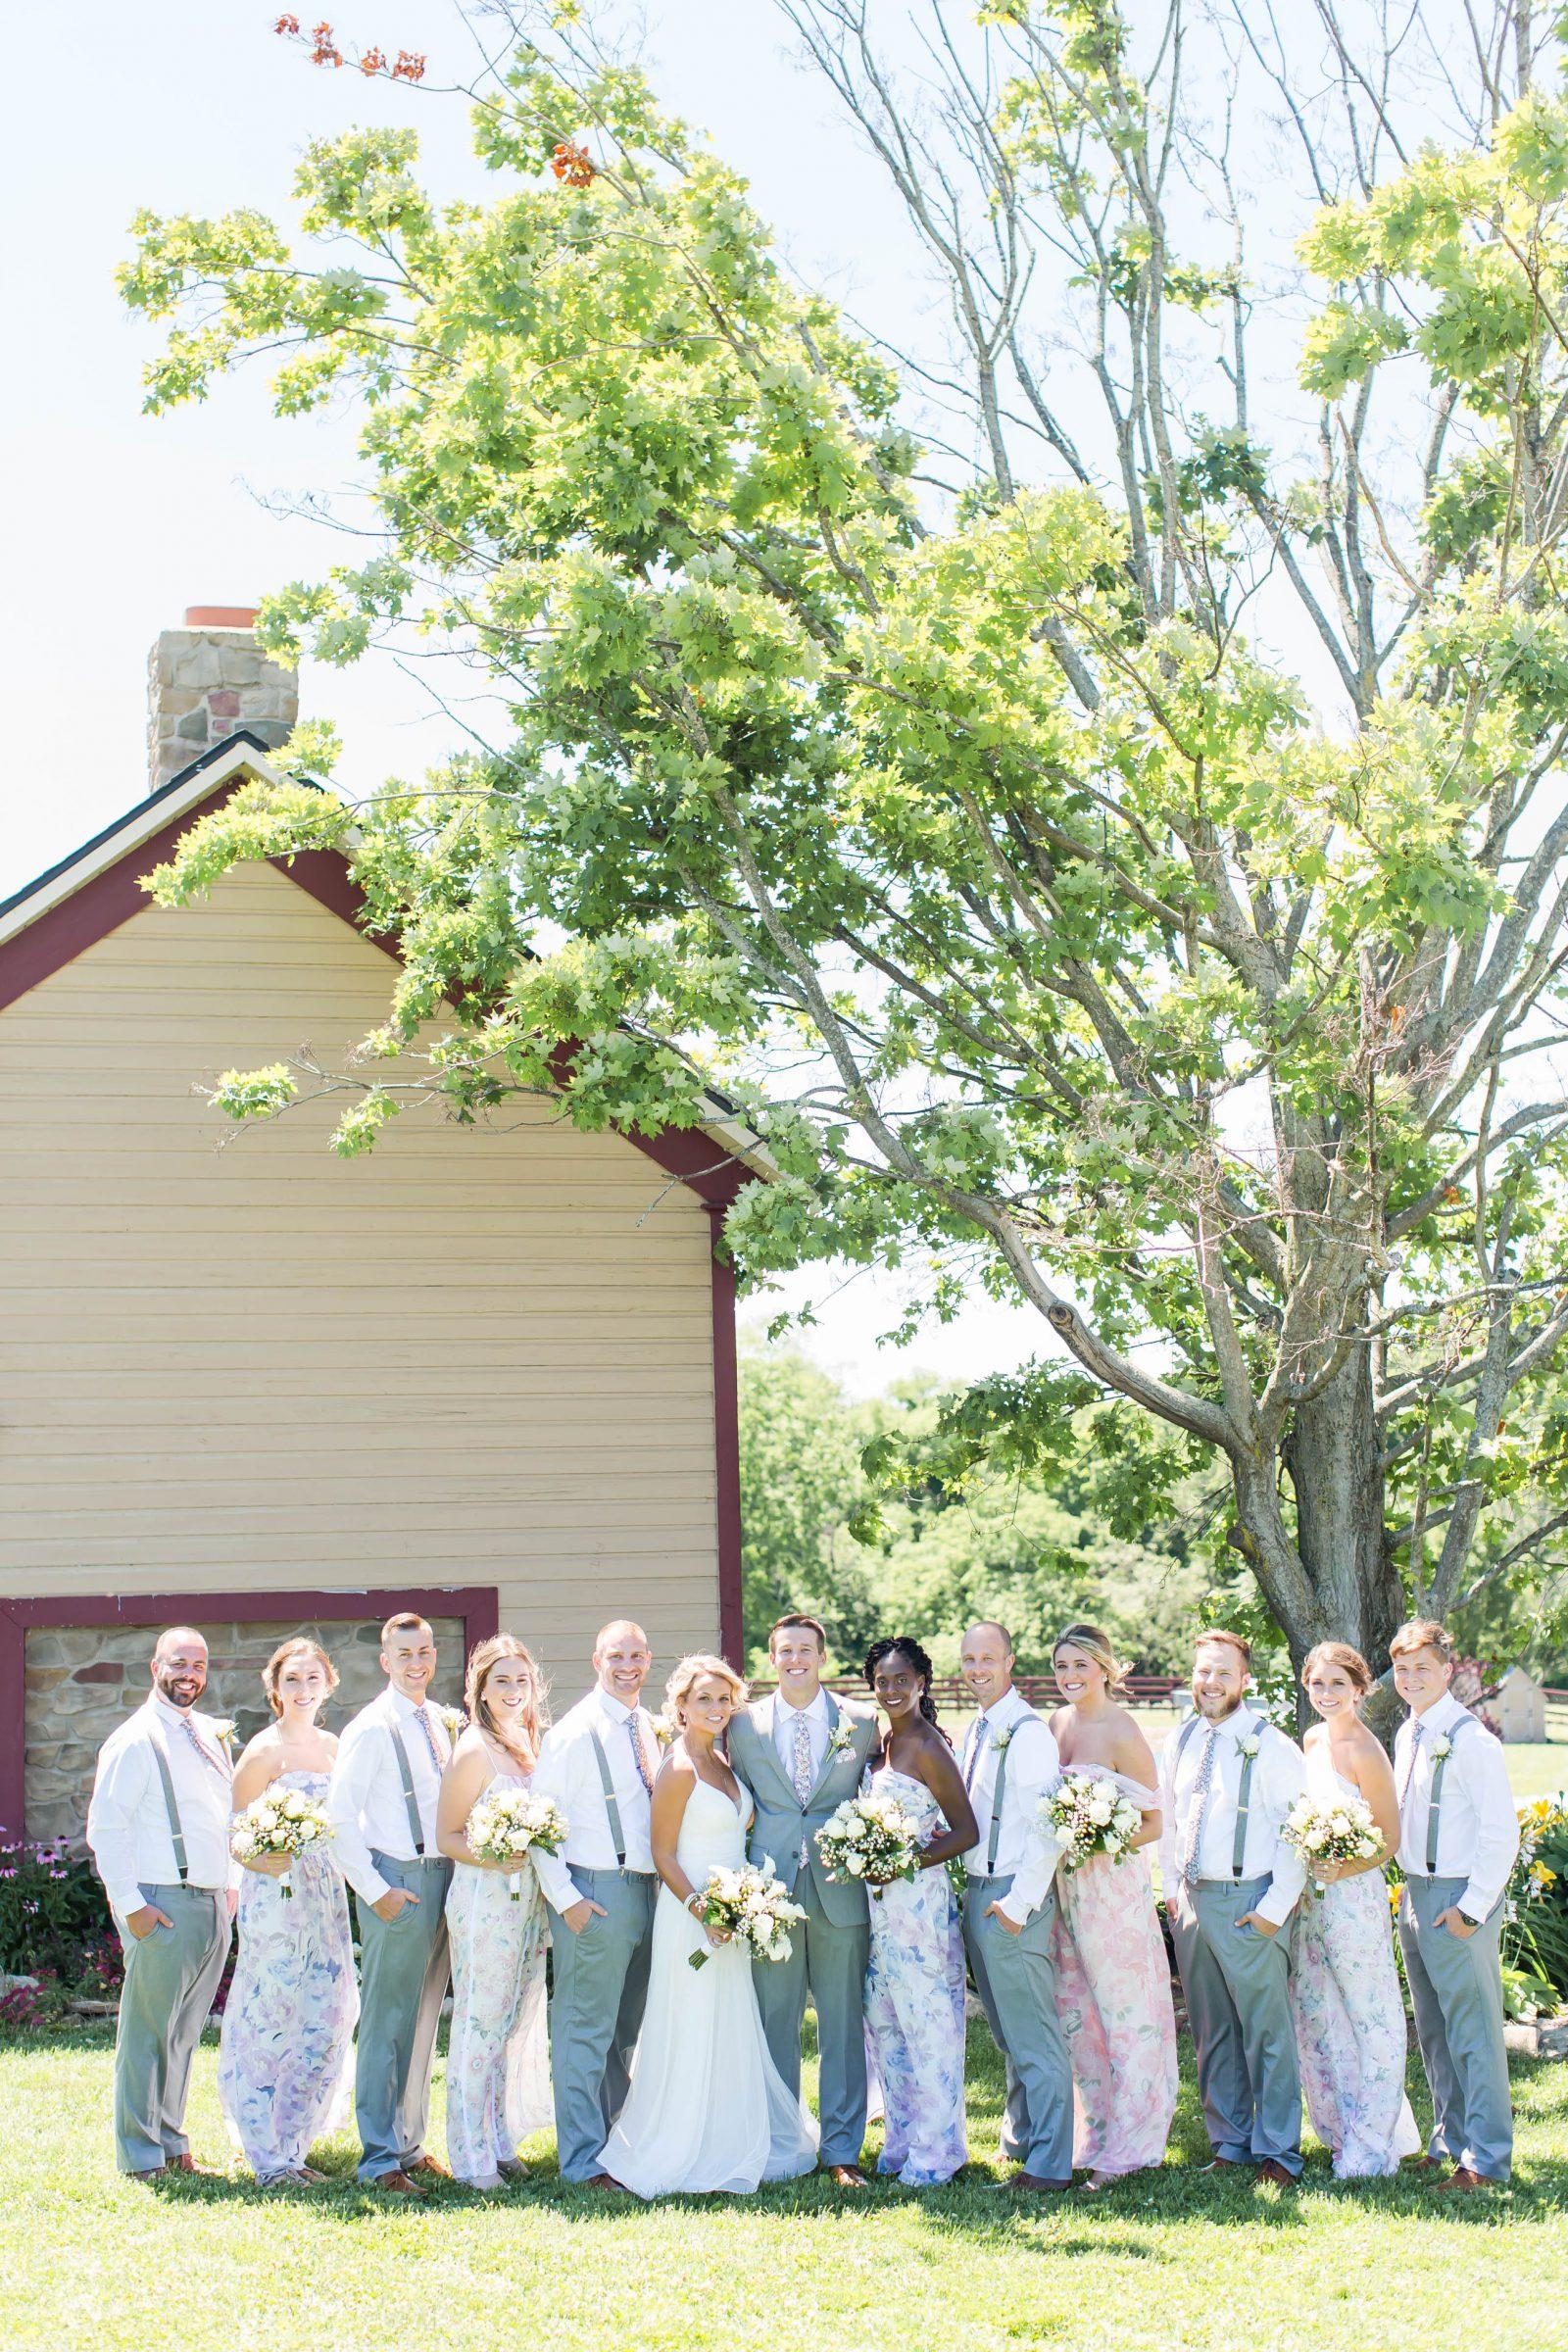 peacock-ridge-summer-wedding-photographer-akron-ohio-loren-jackson-photography-56